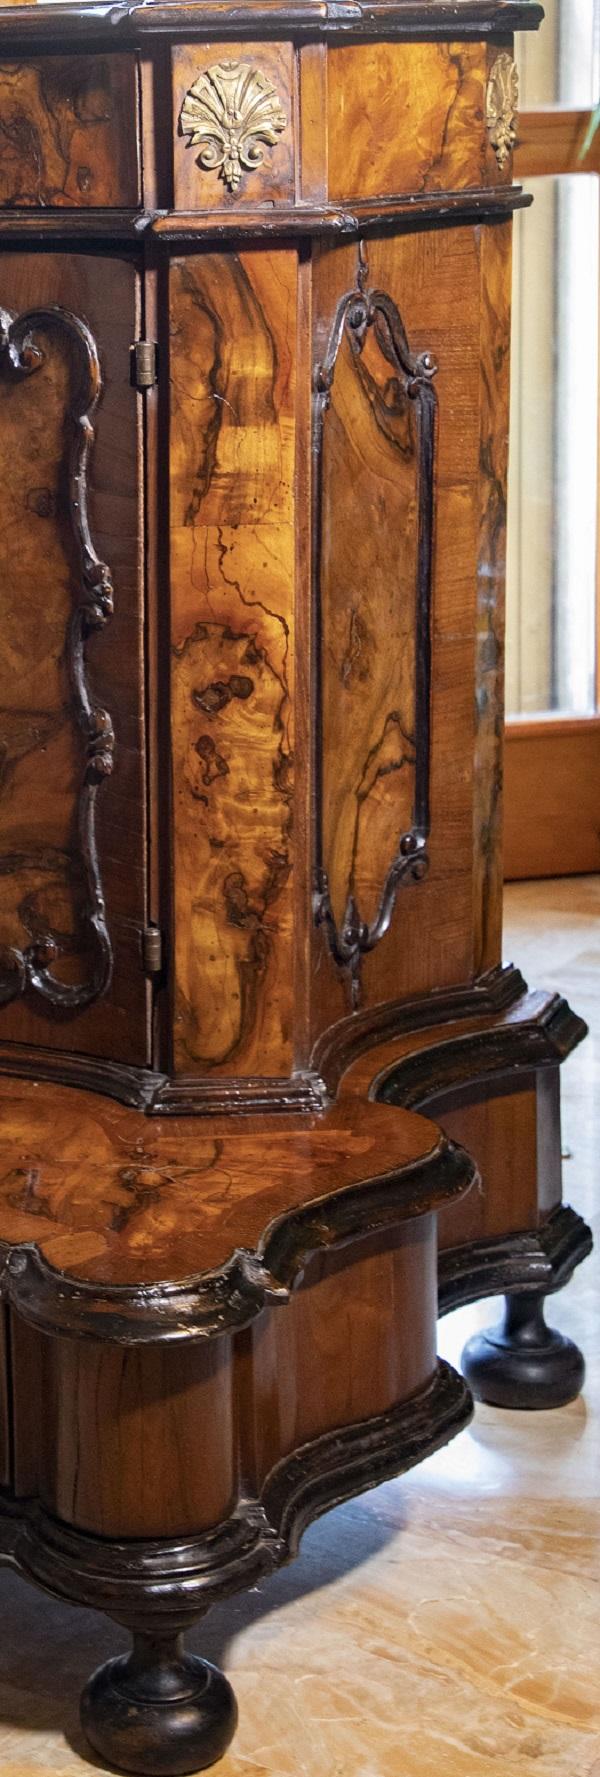 inginocchiatoio-lombardo-xviii-secolo-cardinale-giuseppe-pozzobonelli